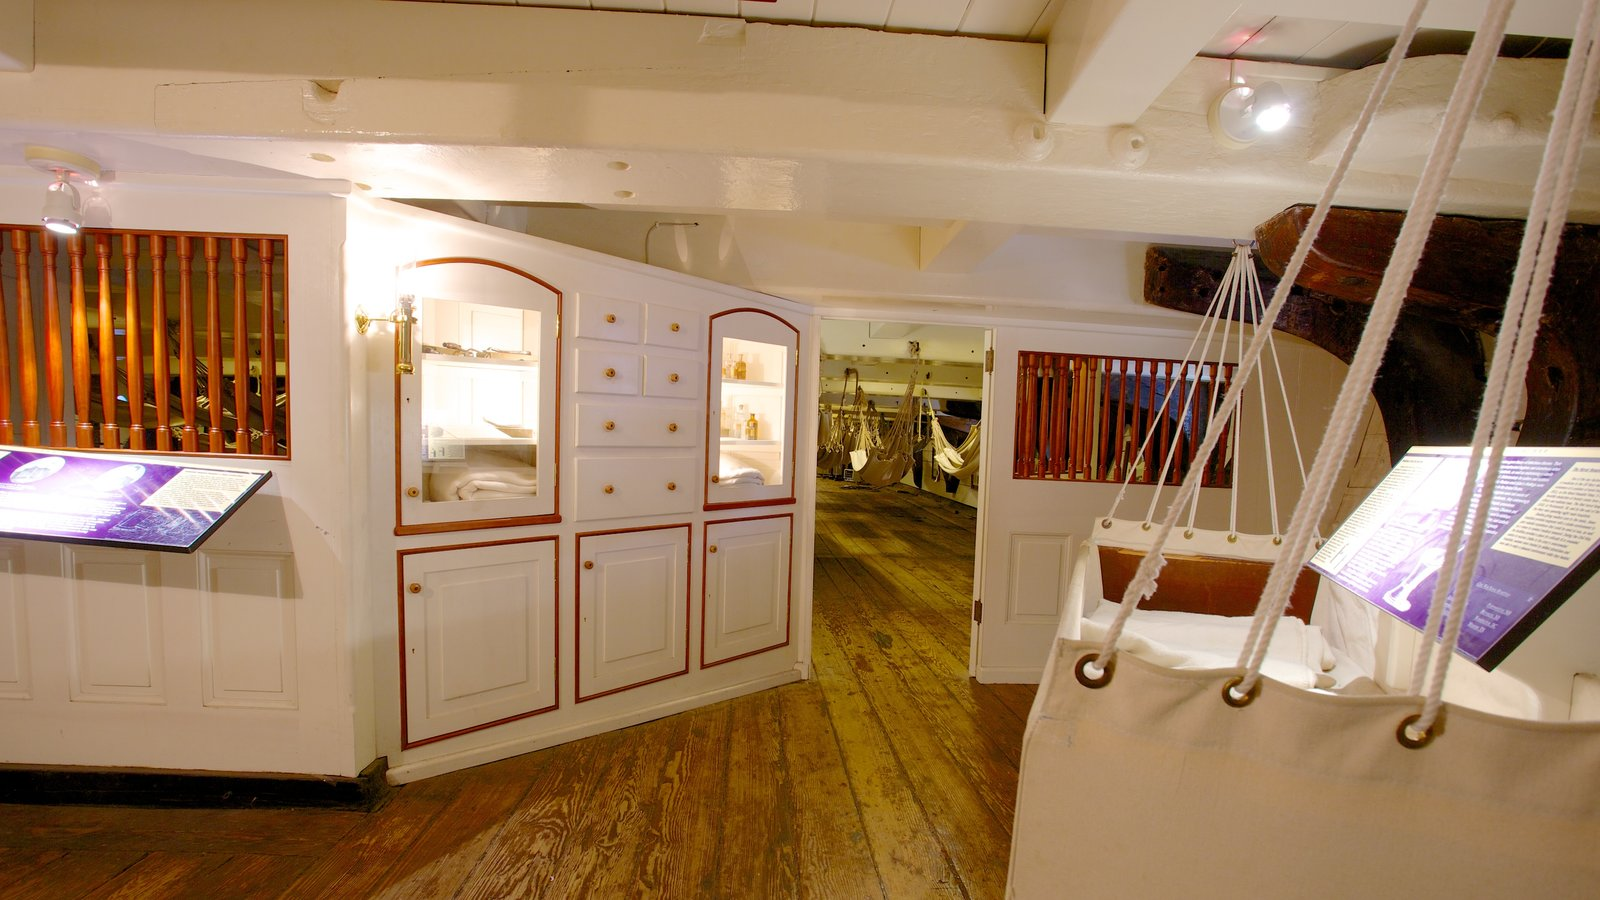 USS Constellation which includes interior views